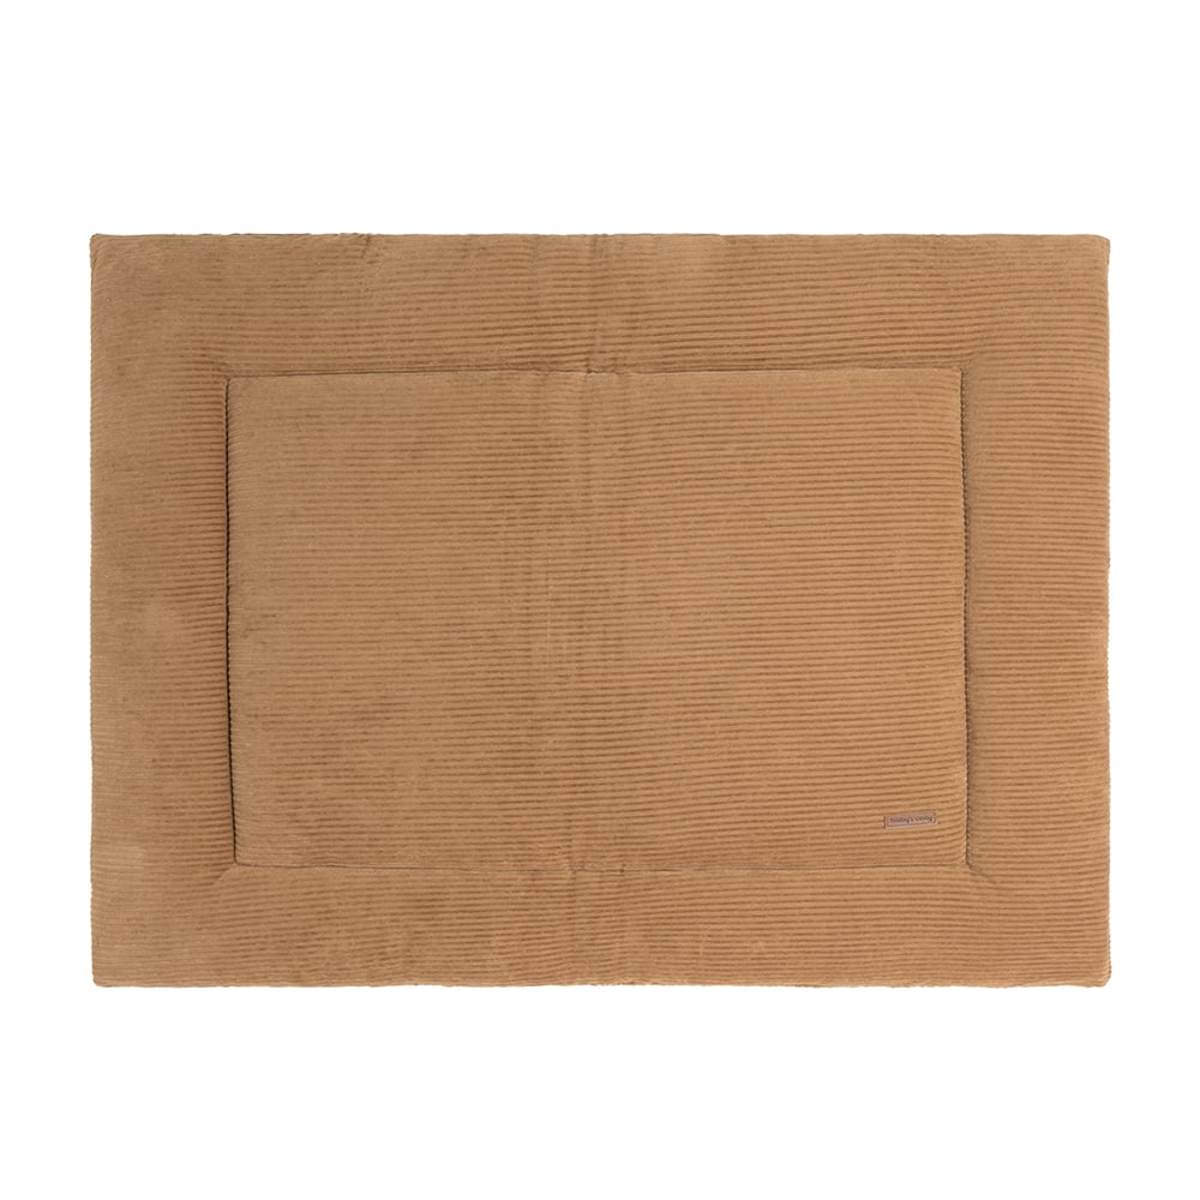 babys only bo02400203751 boxkleed 80x100 cm sense caramel 1